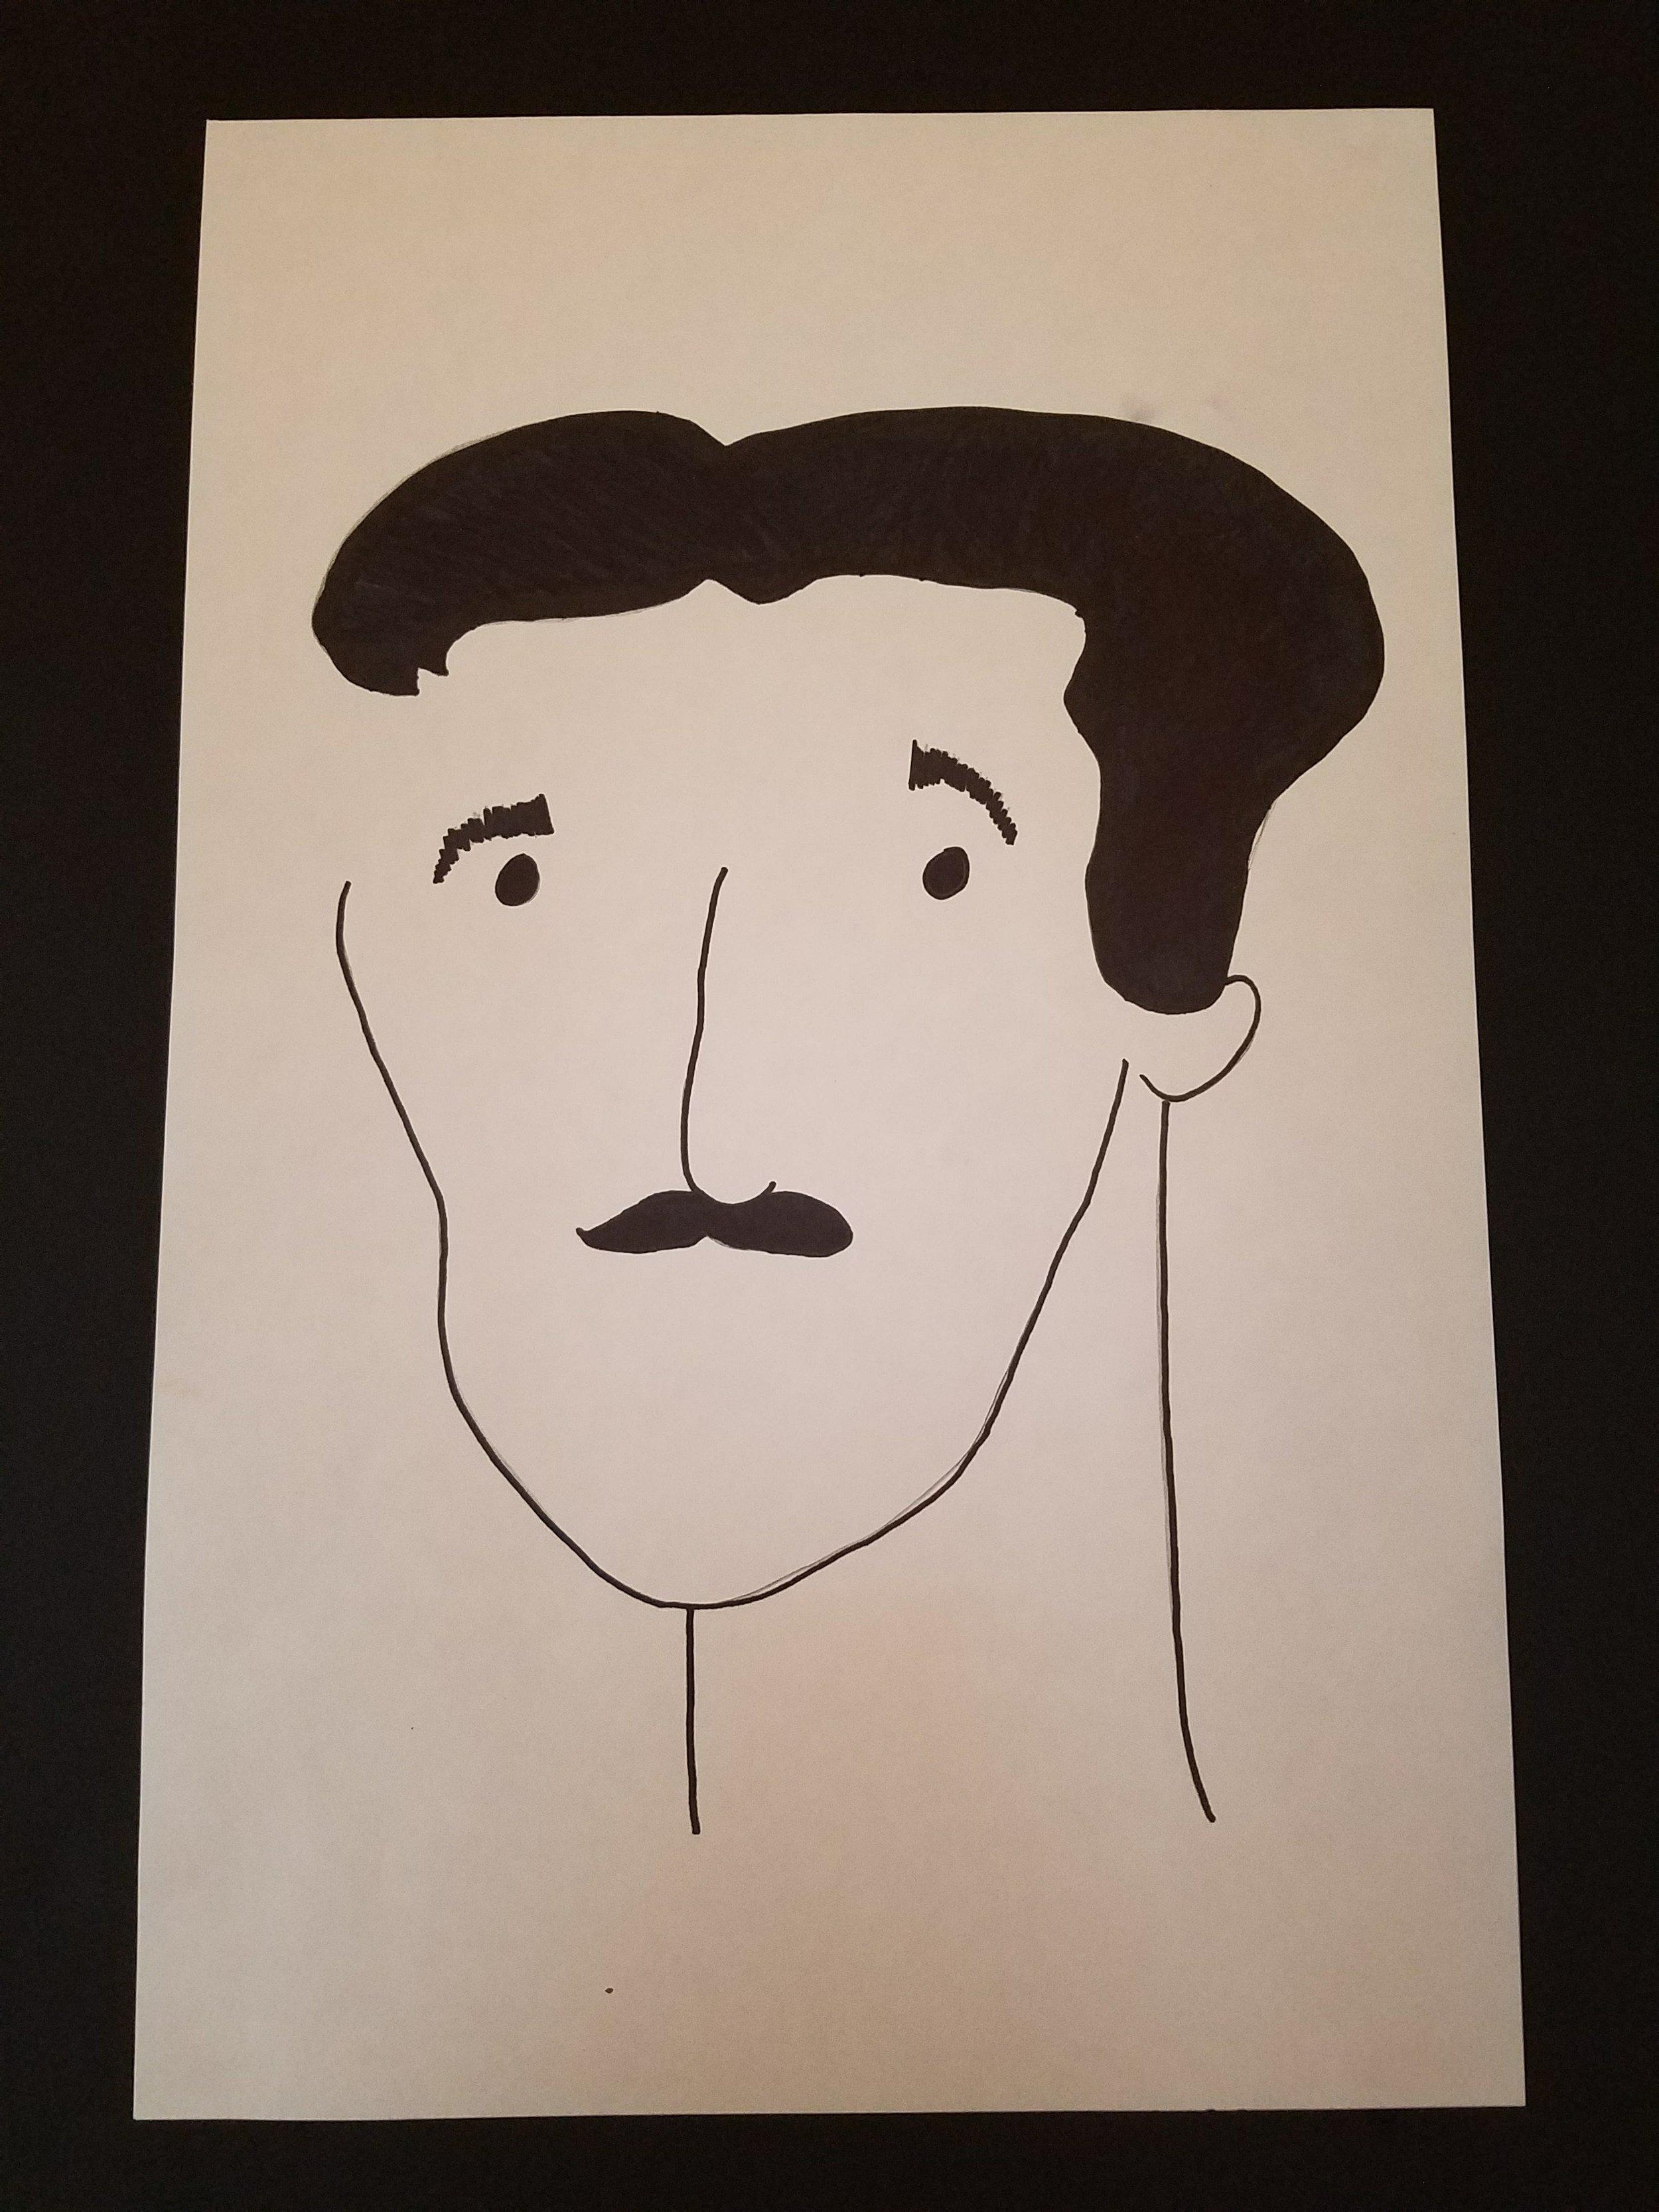 Nikola Tesla  Artwork by Liam Polonijo